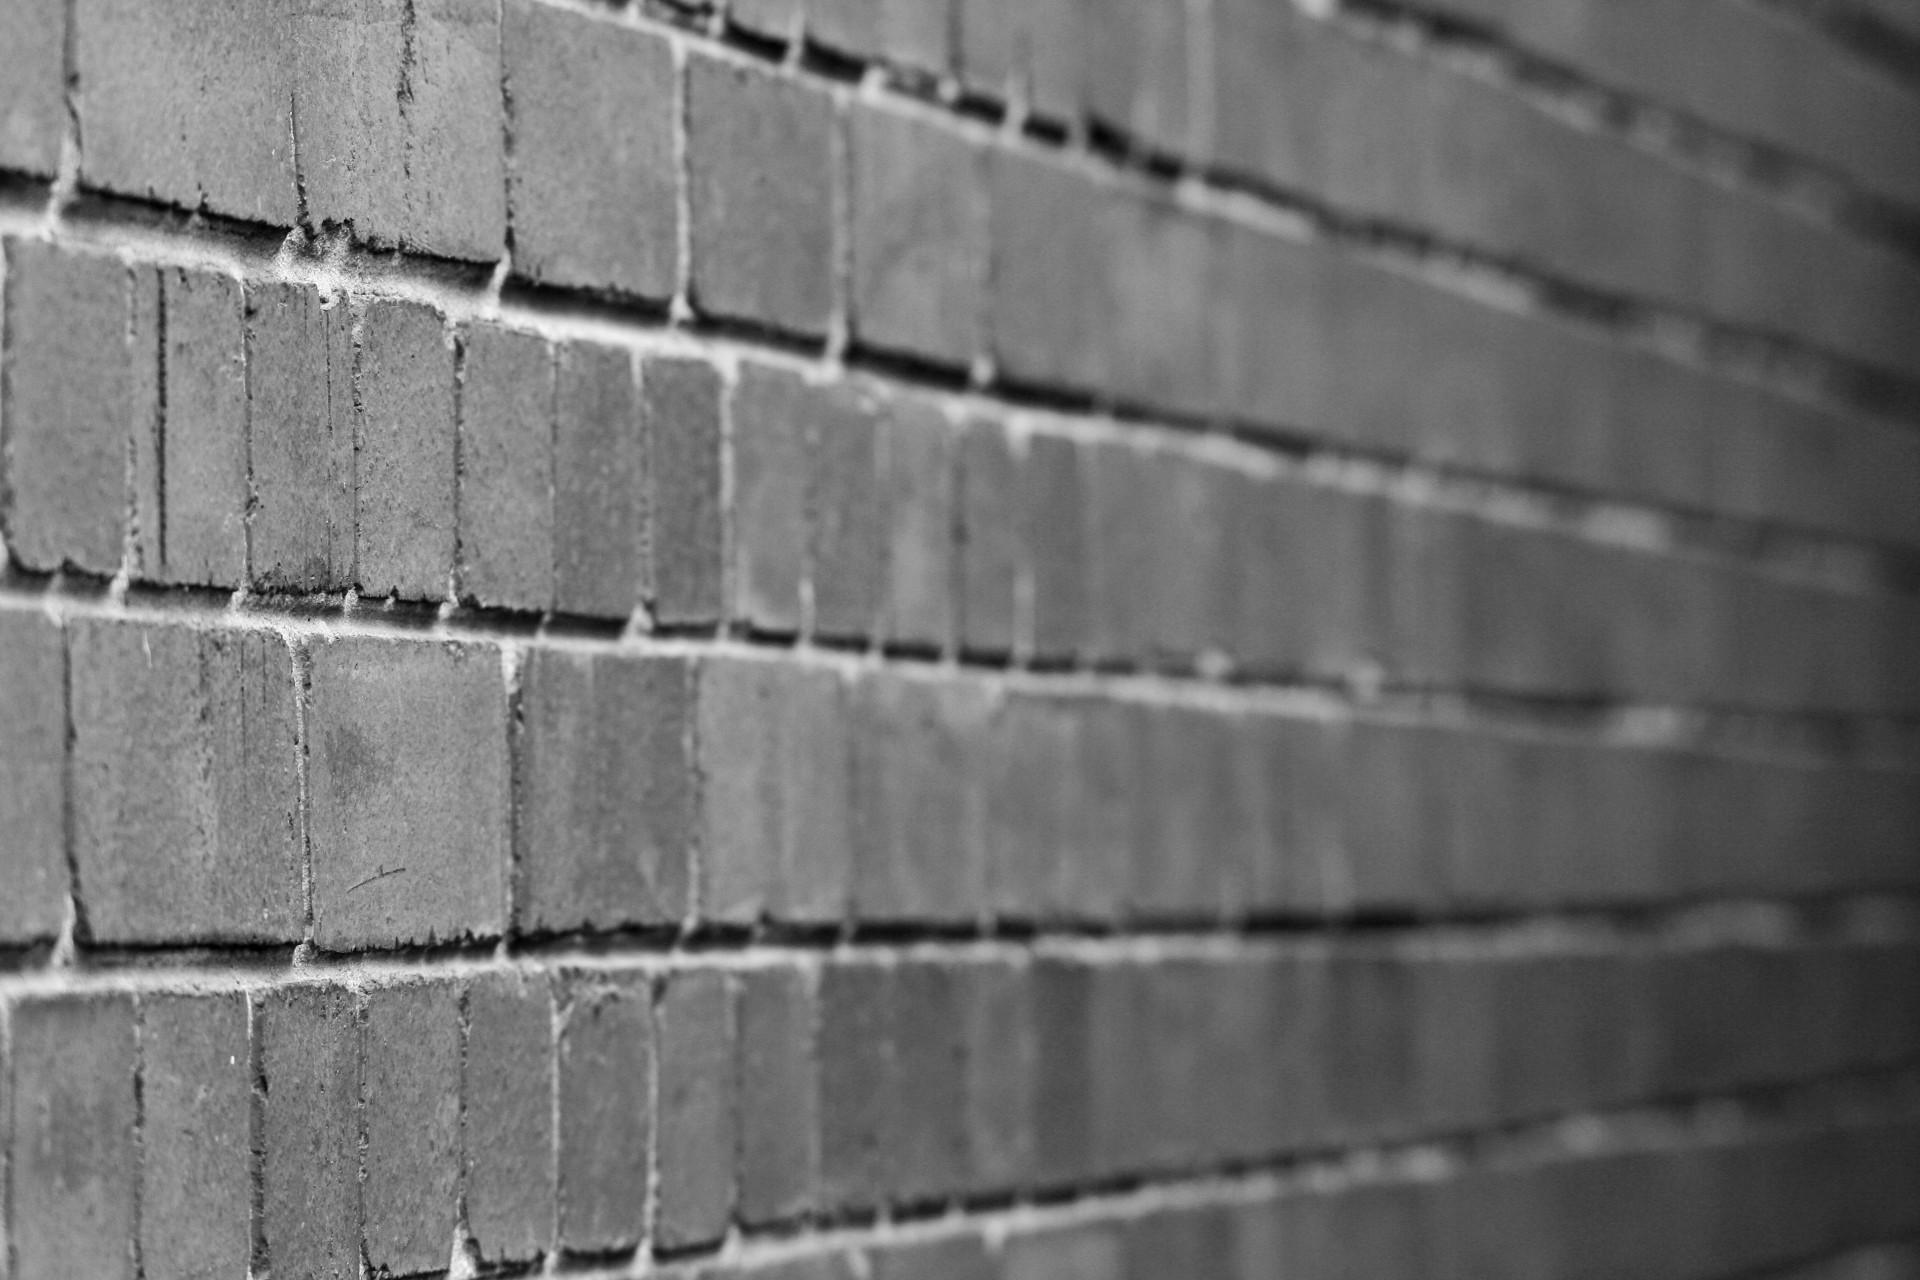 Black & White Brick Wall Free Stock Photo